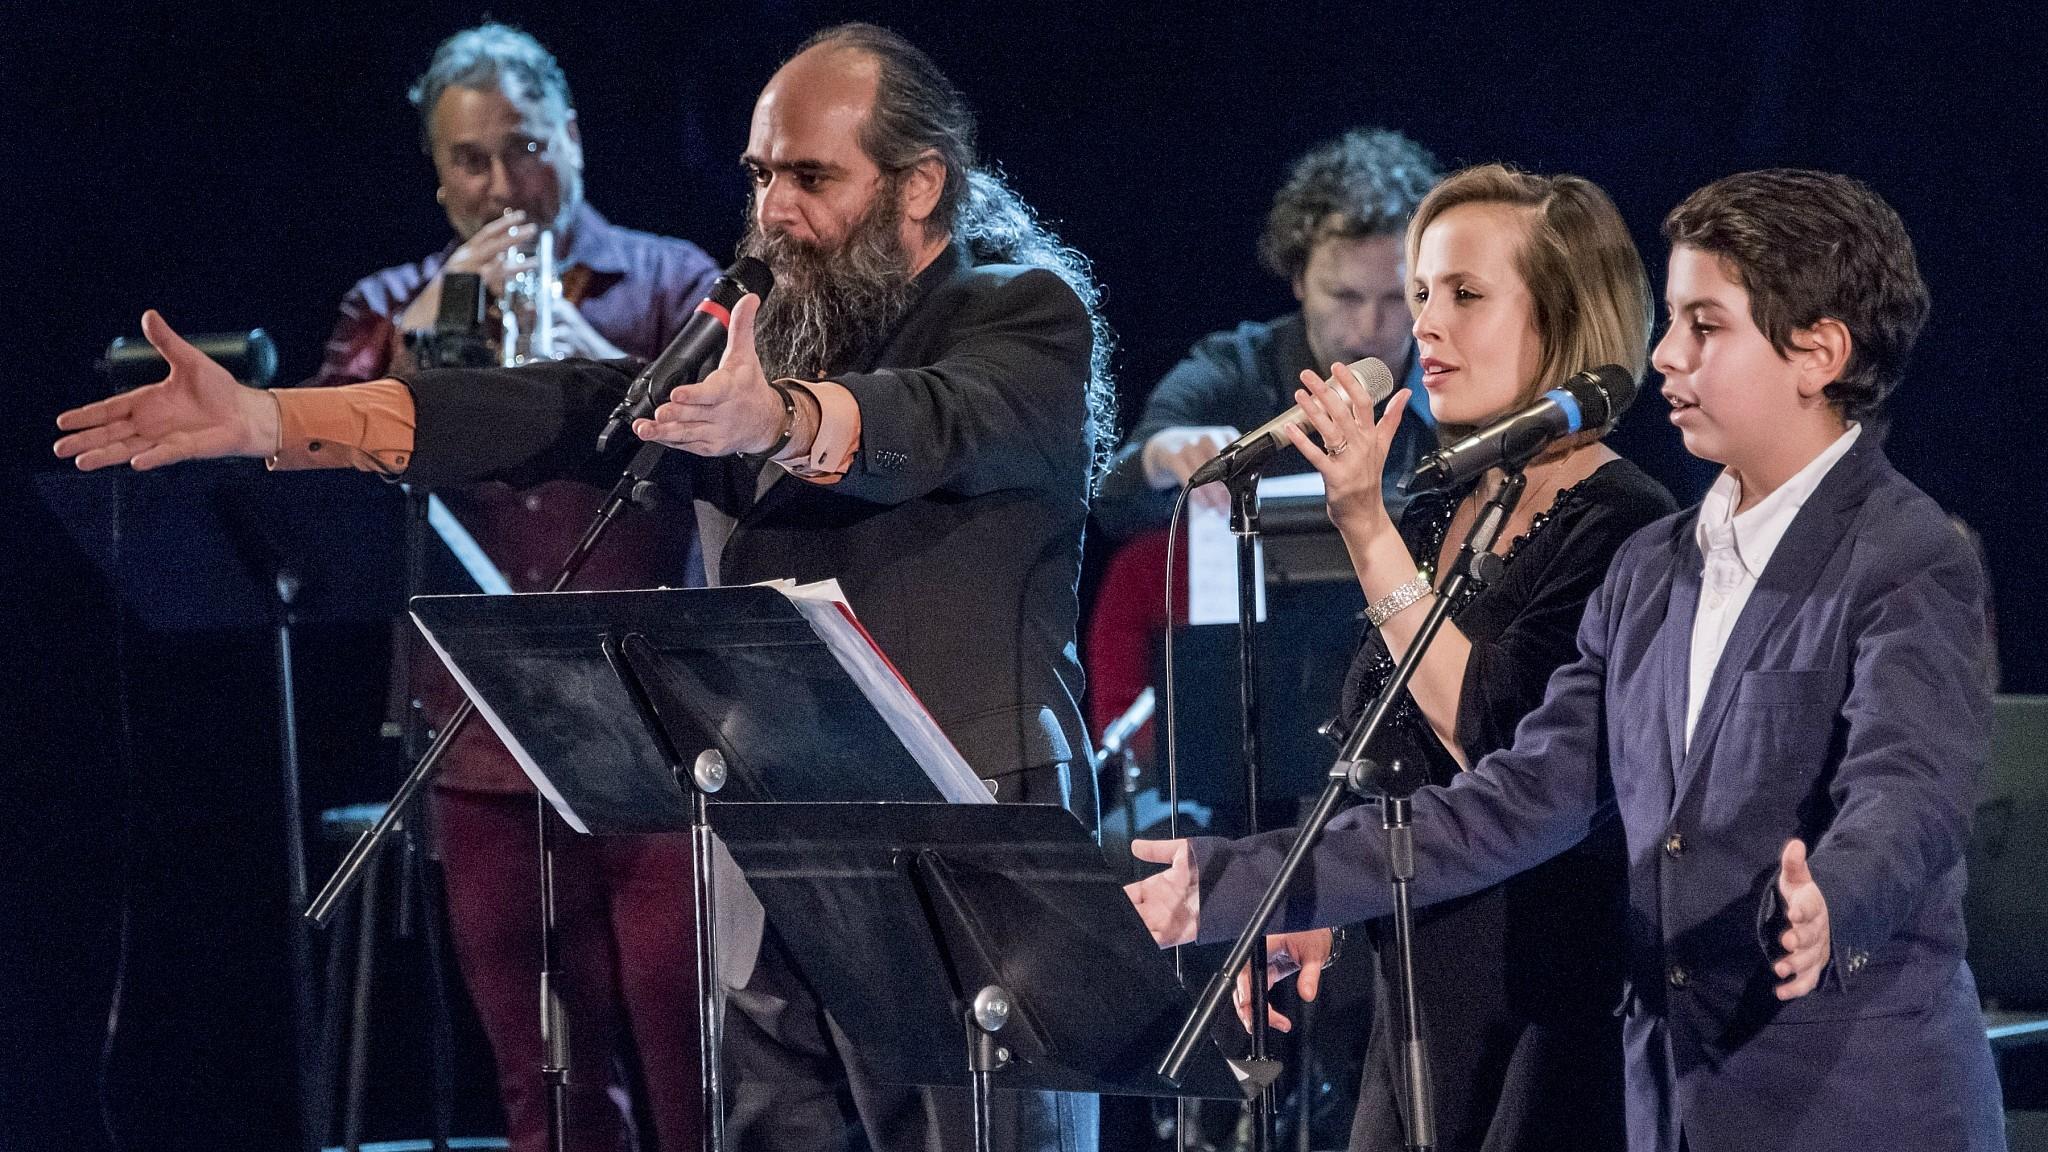 From left: Psoy Korolenko, Sophie Milman and Isaac Rosenberg sing songs from 'Yiddish Glory' (Vladimir Kevorkov)